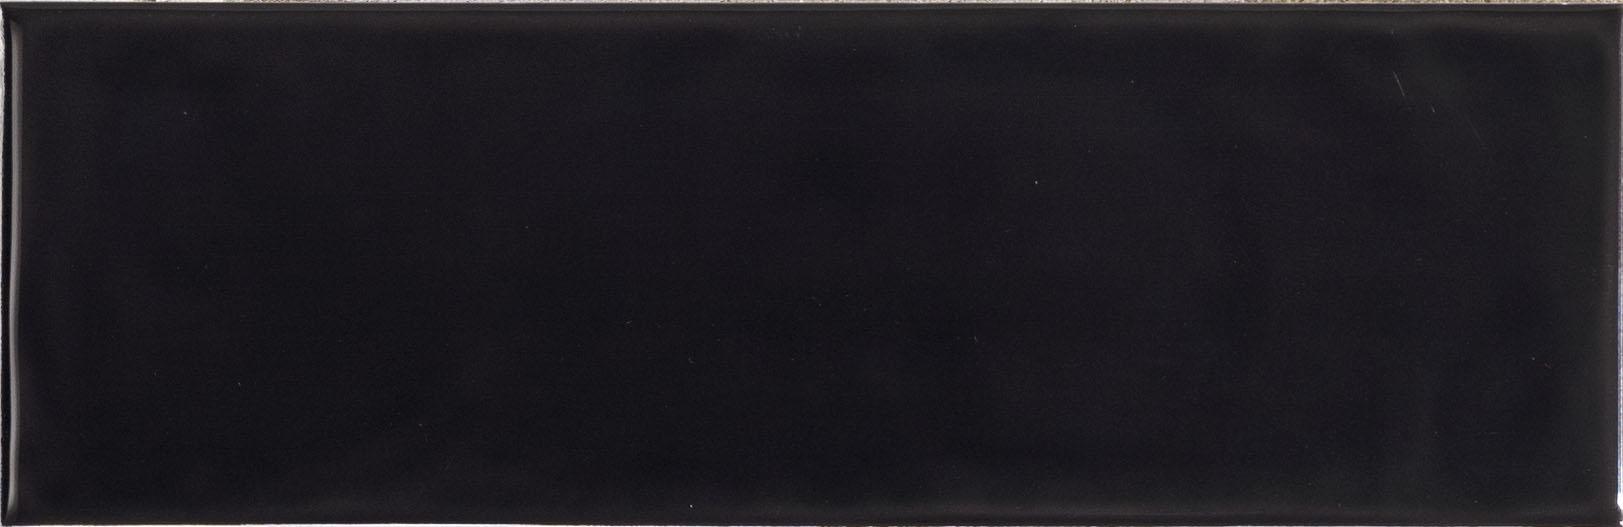 0190931, Brick Inspiration, Musta, seina